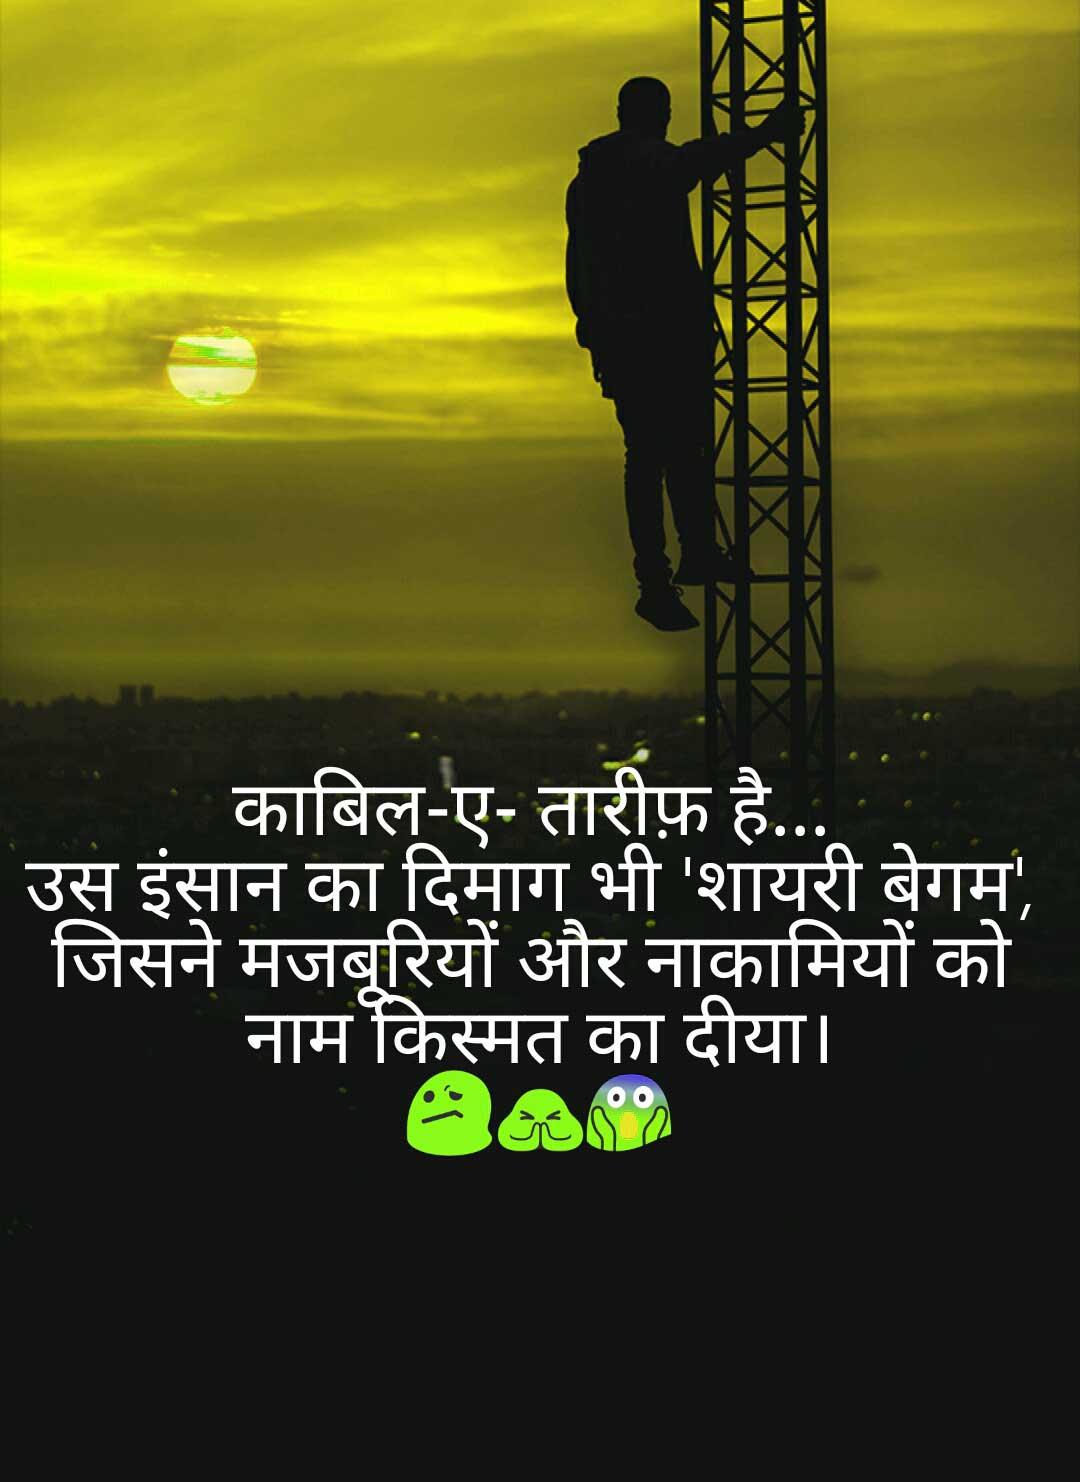 Hindi Love Whatsapp DP Download photo